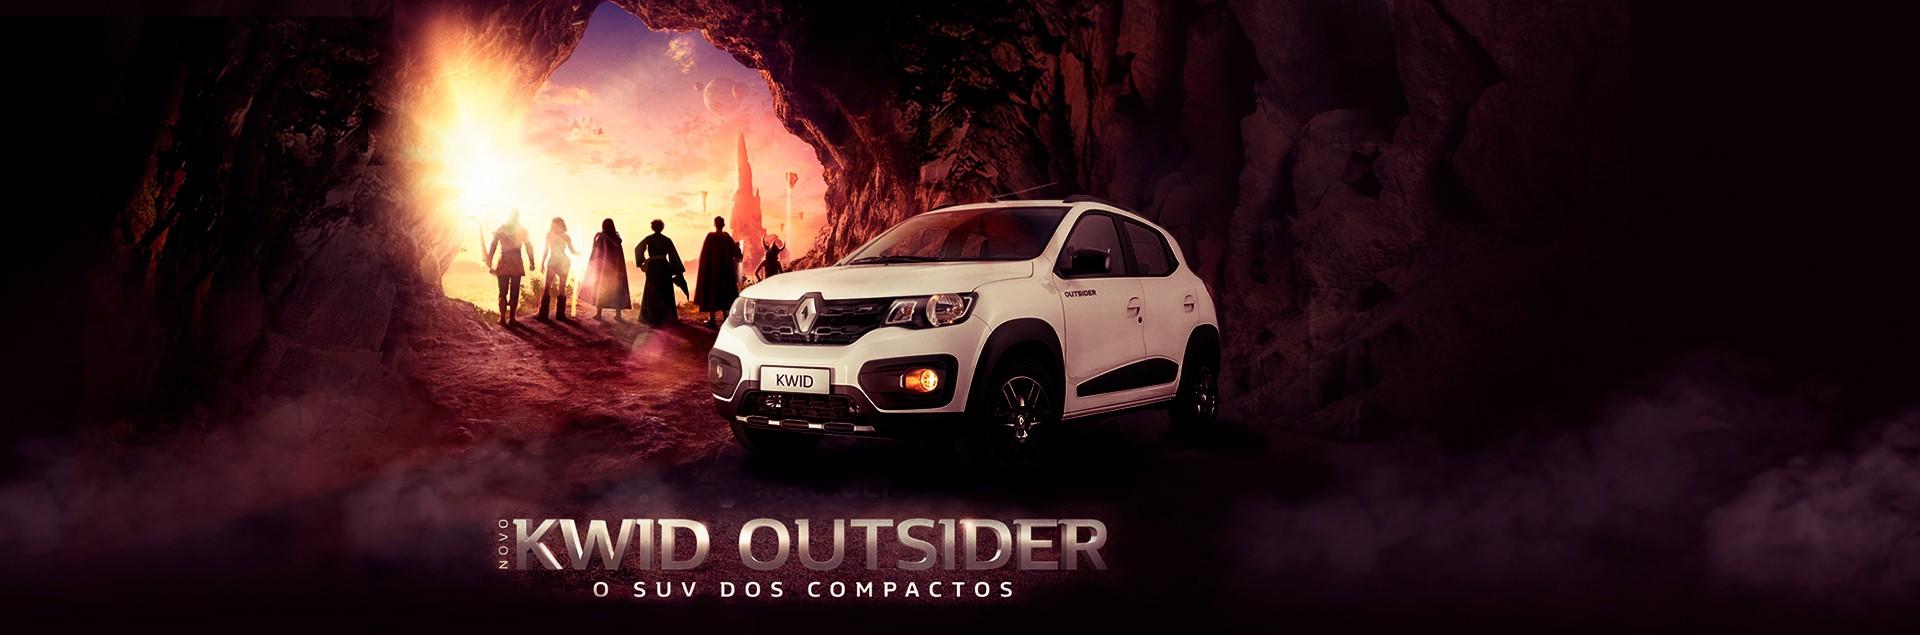 banner-hoje-kwid-outsider